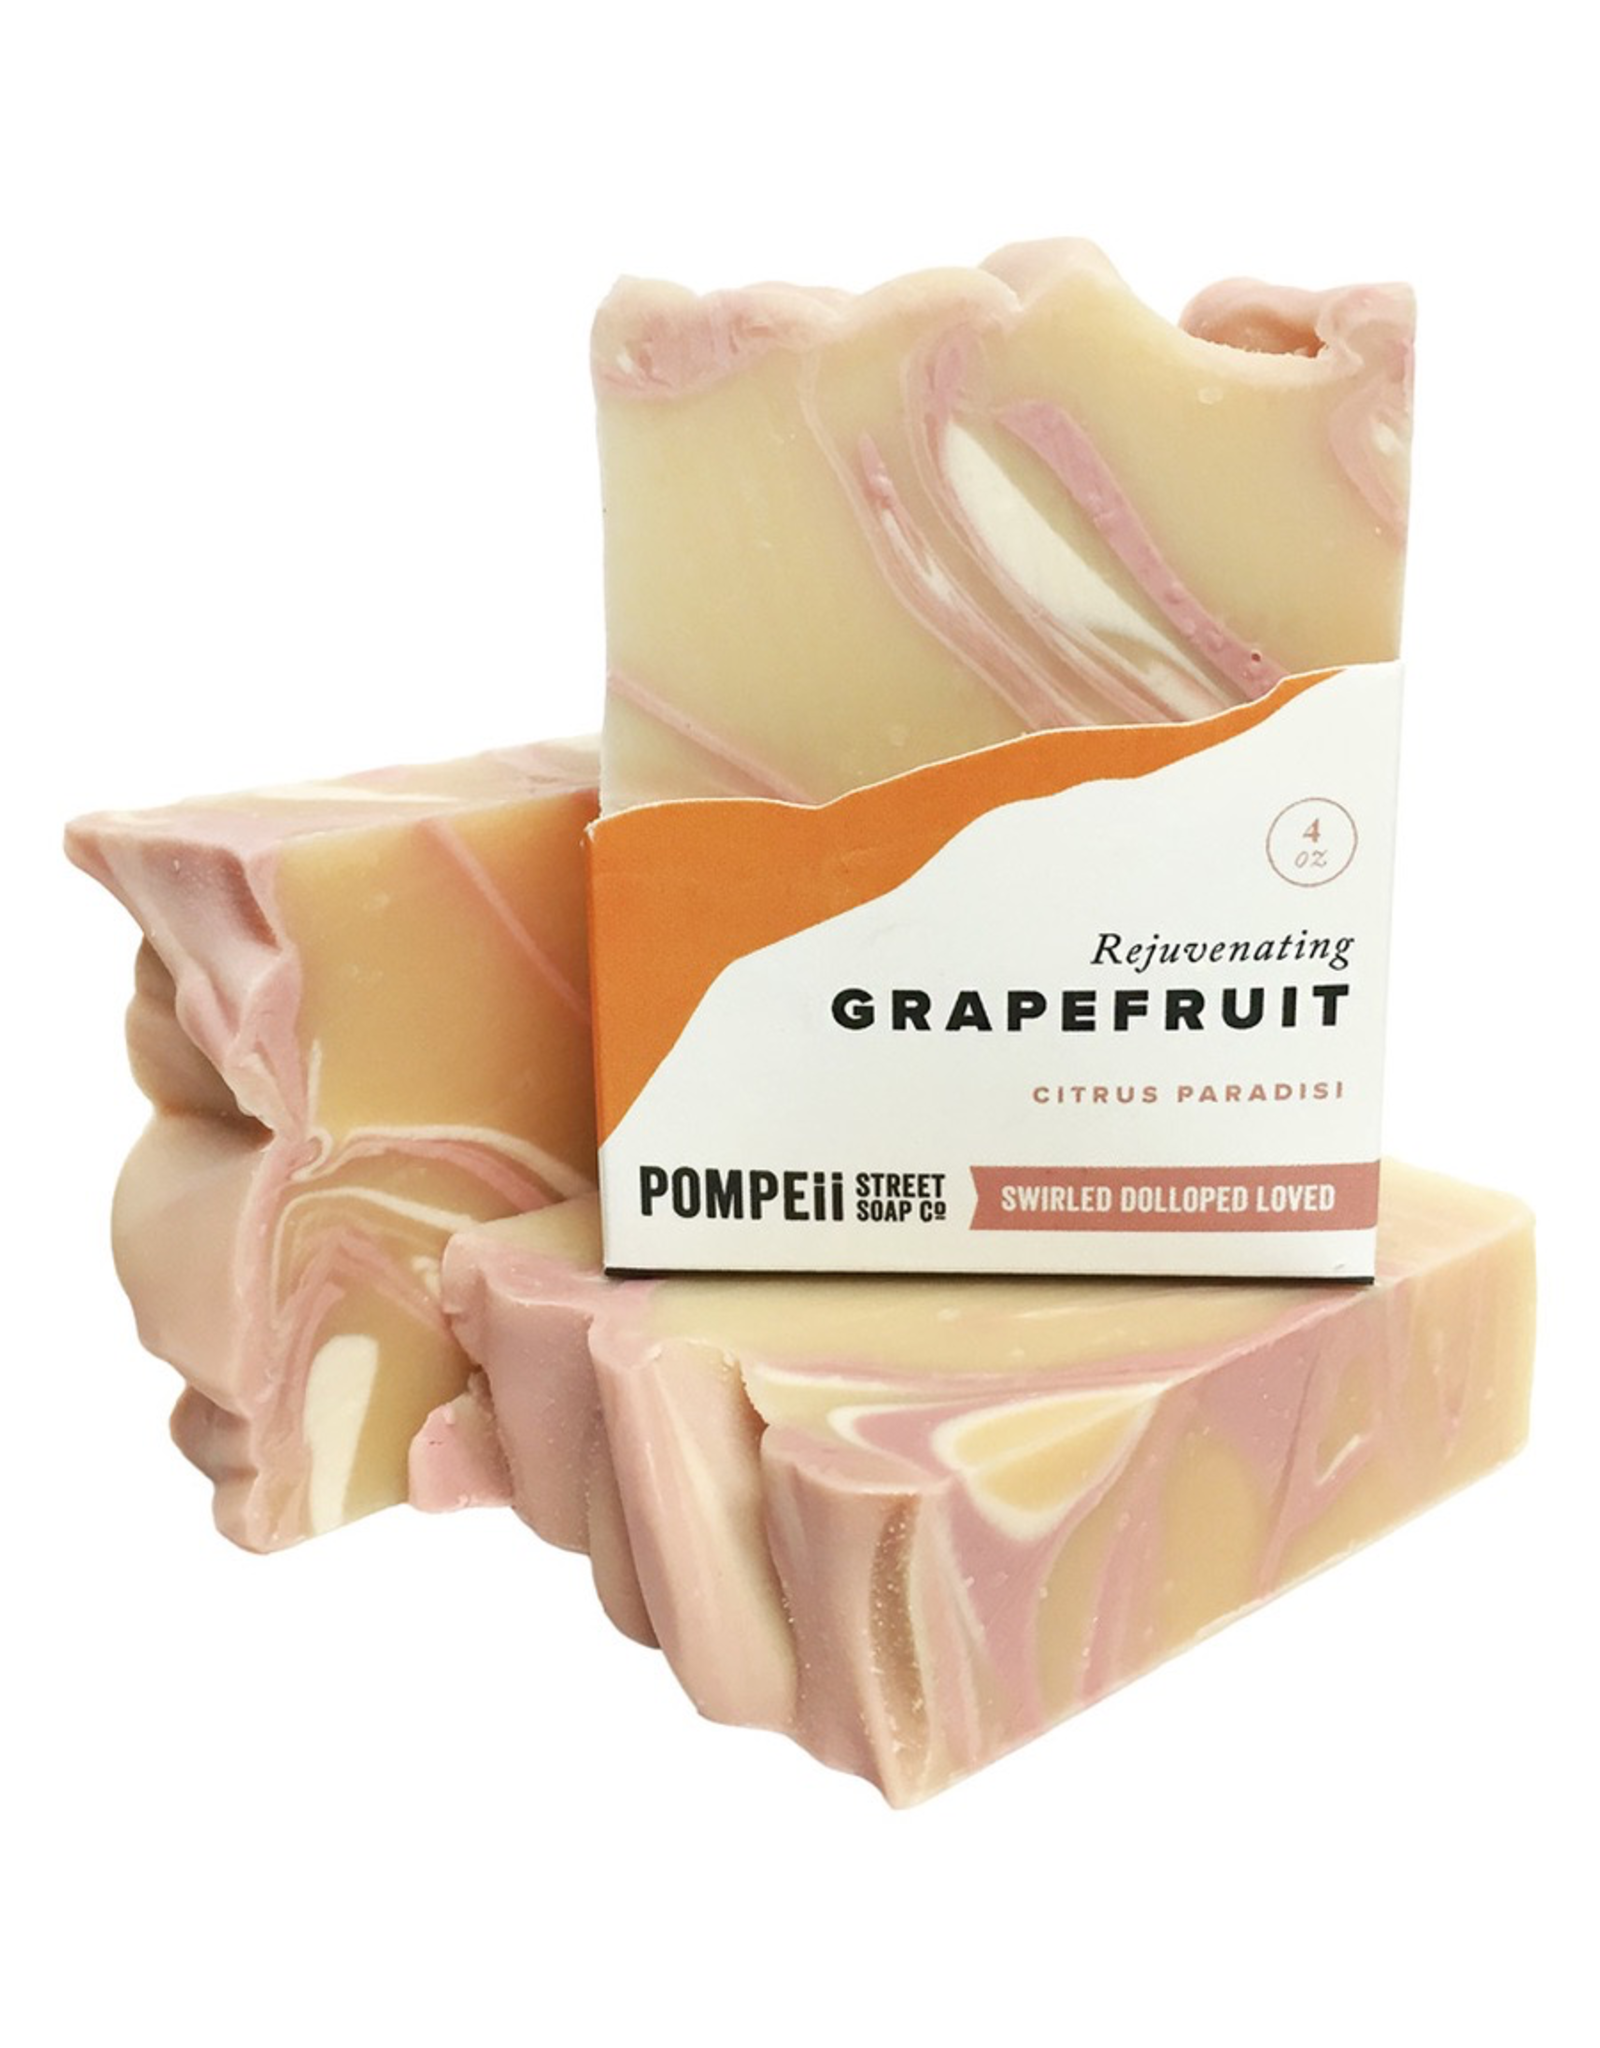 Pompeii Grapefruit Soap 4 oz.